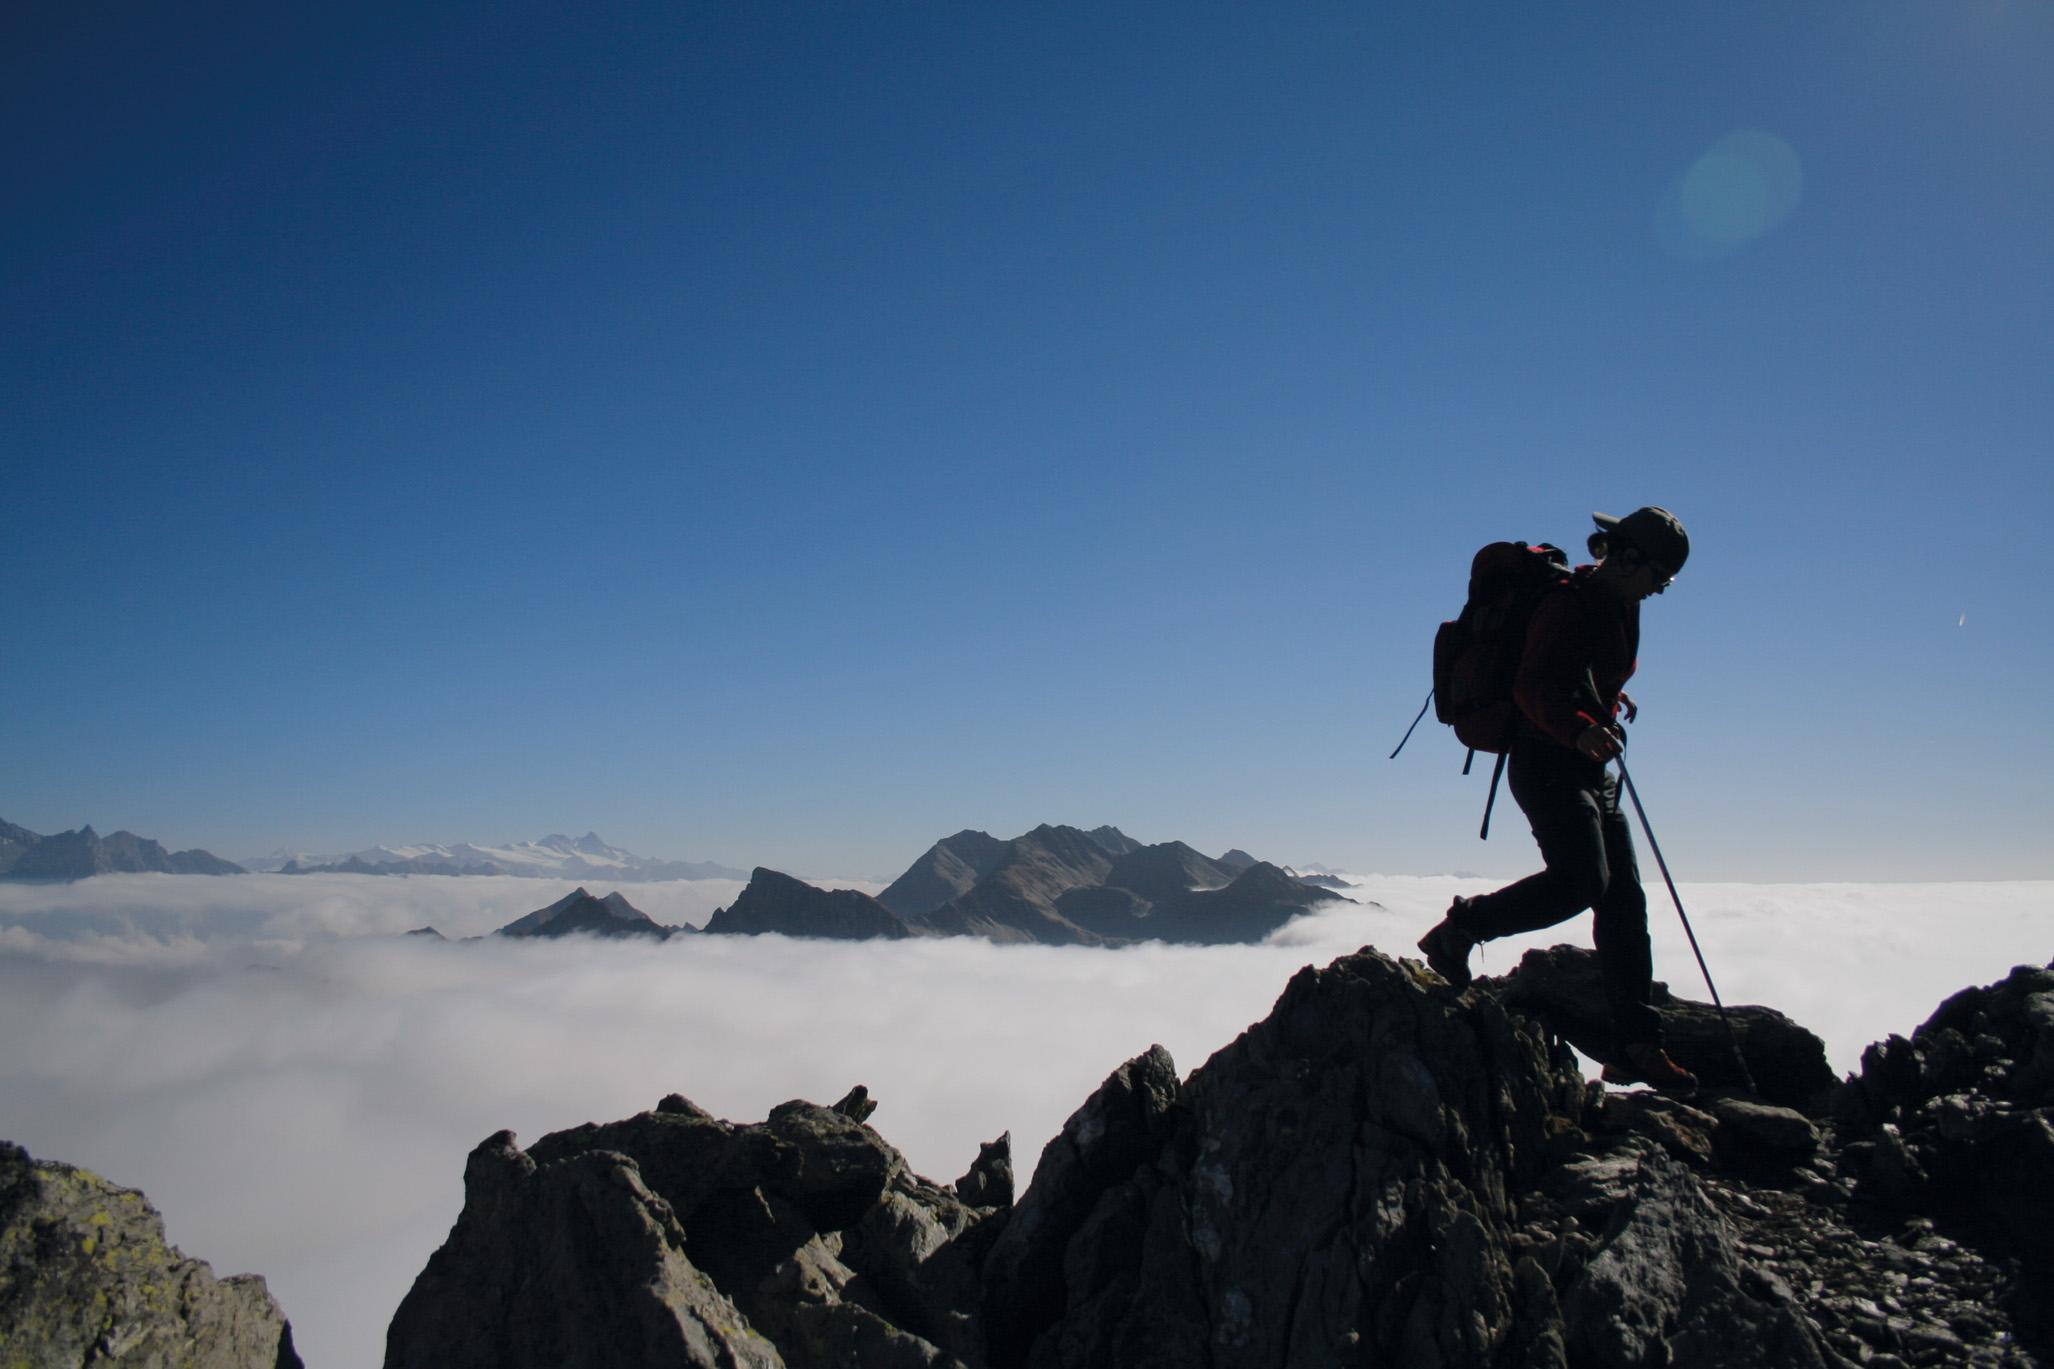 Wandern entlang der Gipfel - Virgentaler Höhenwege